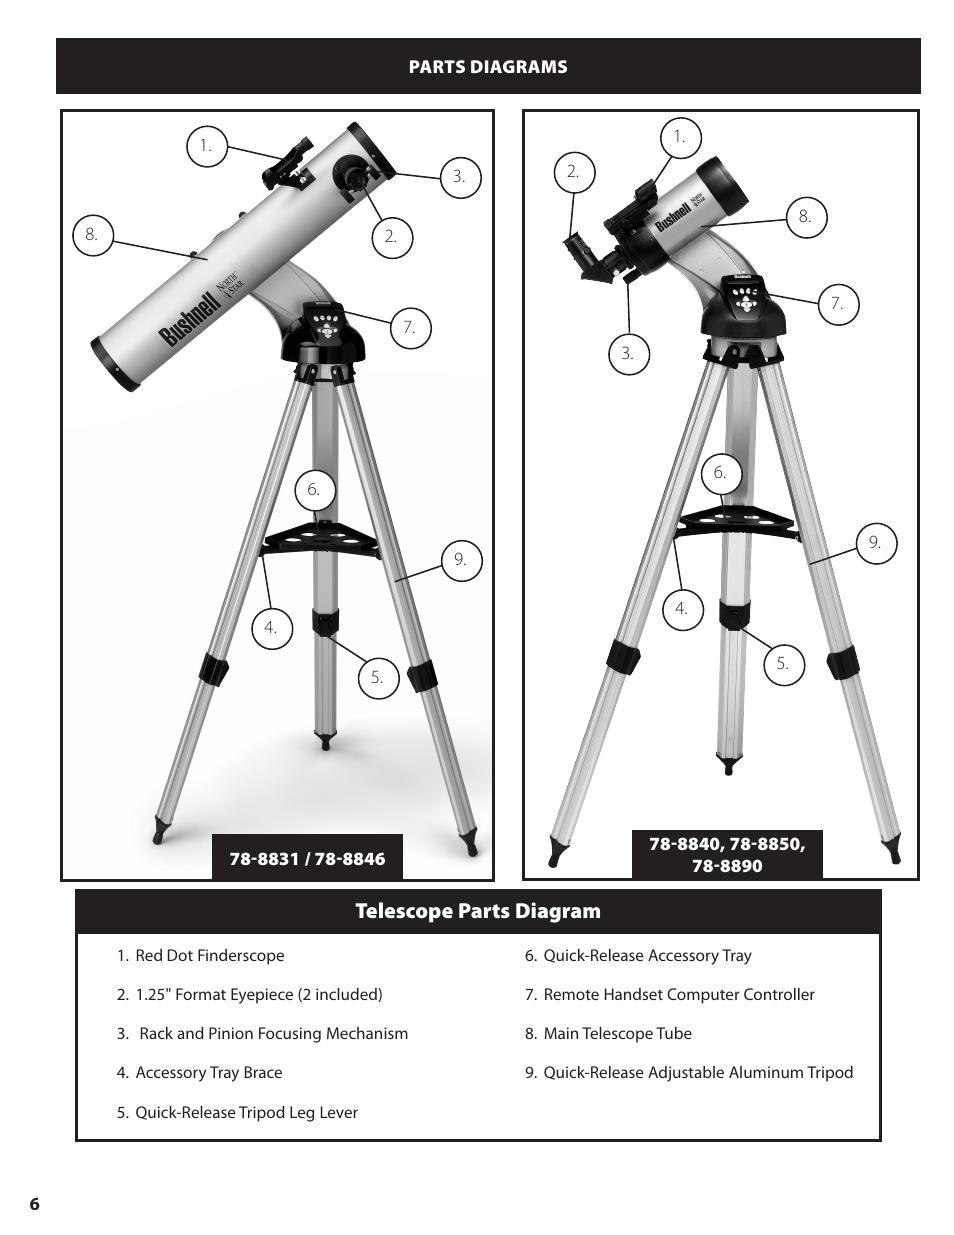 Telescope parts diagram | Bushnell NORTH STAR GOTO 78-8840